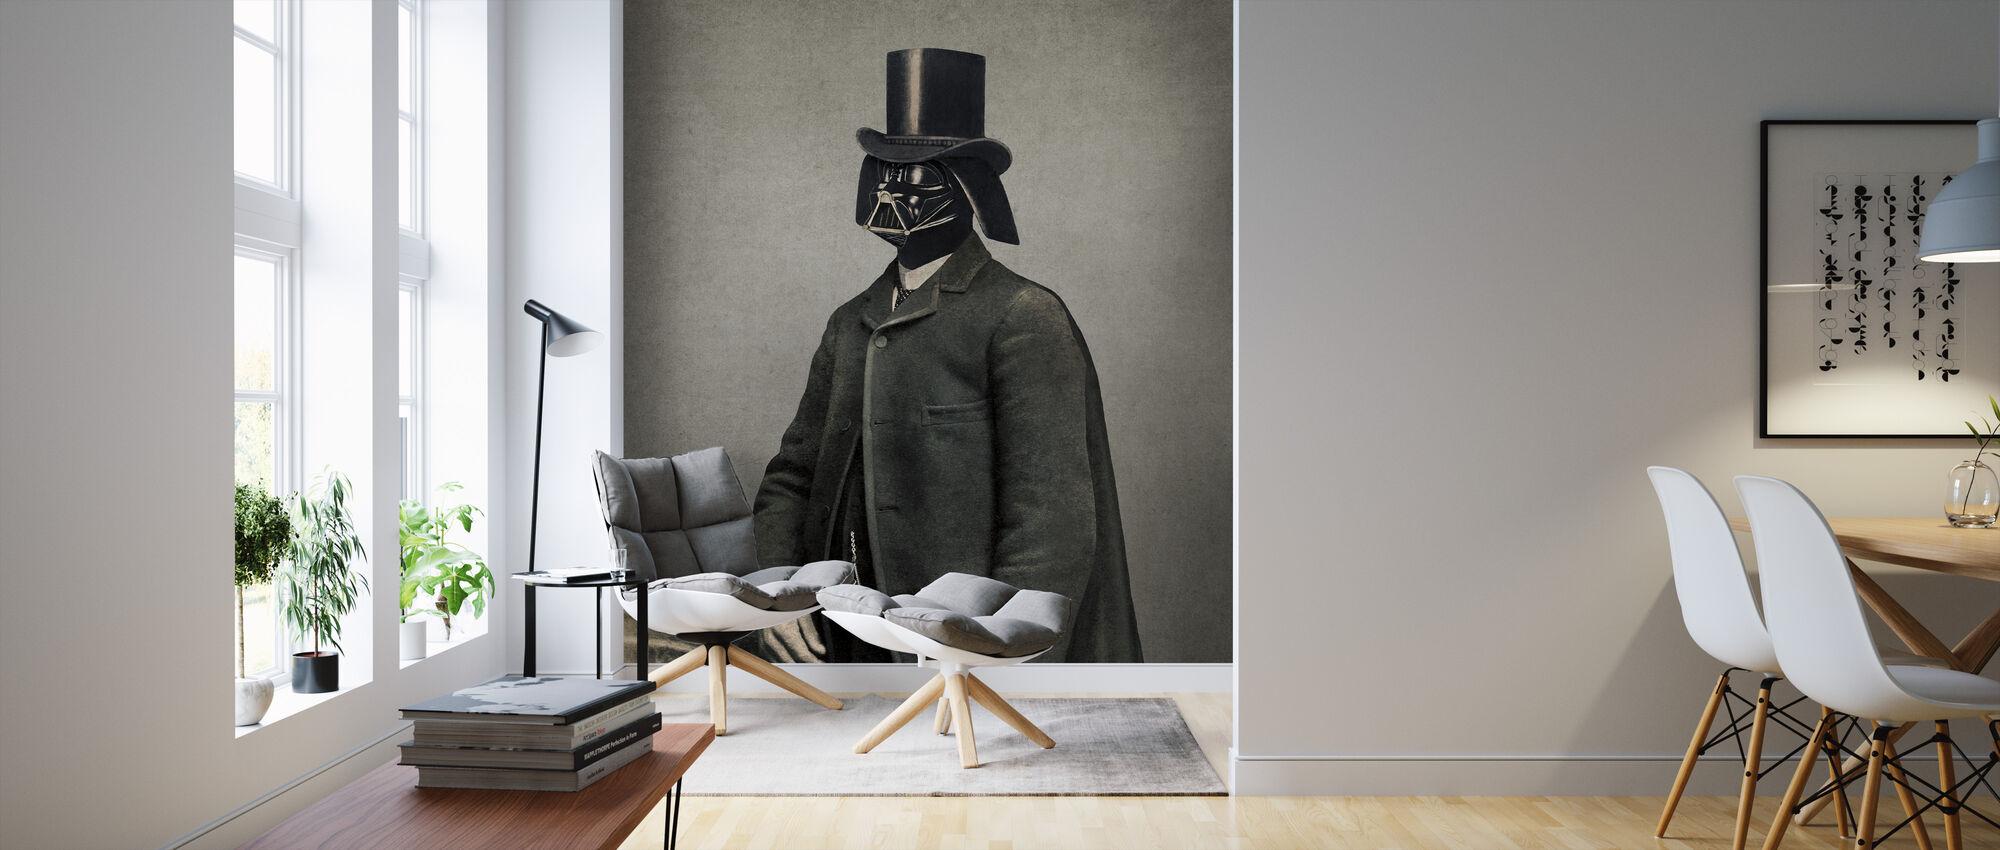 Viktorianske kriger Lord Vadersworth - Tapet - Stue